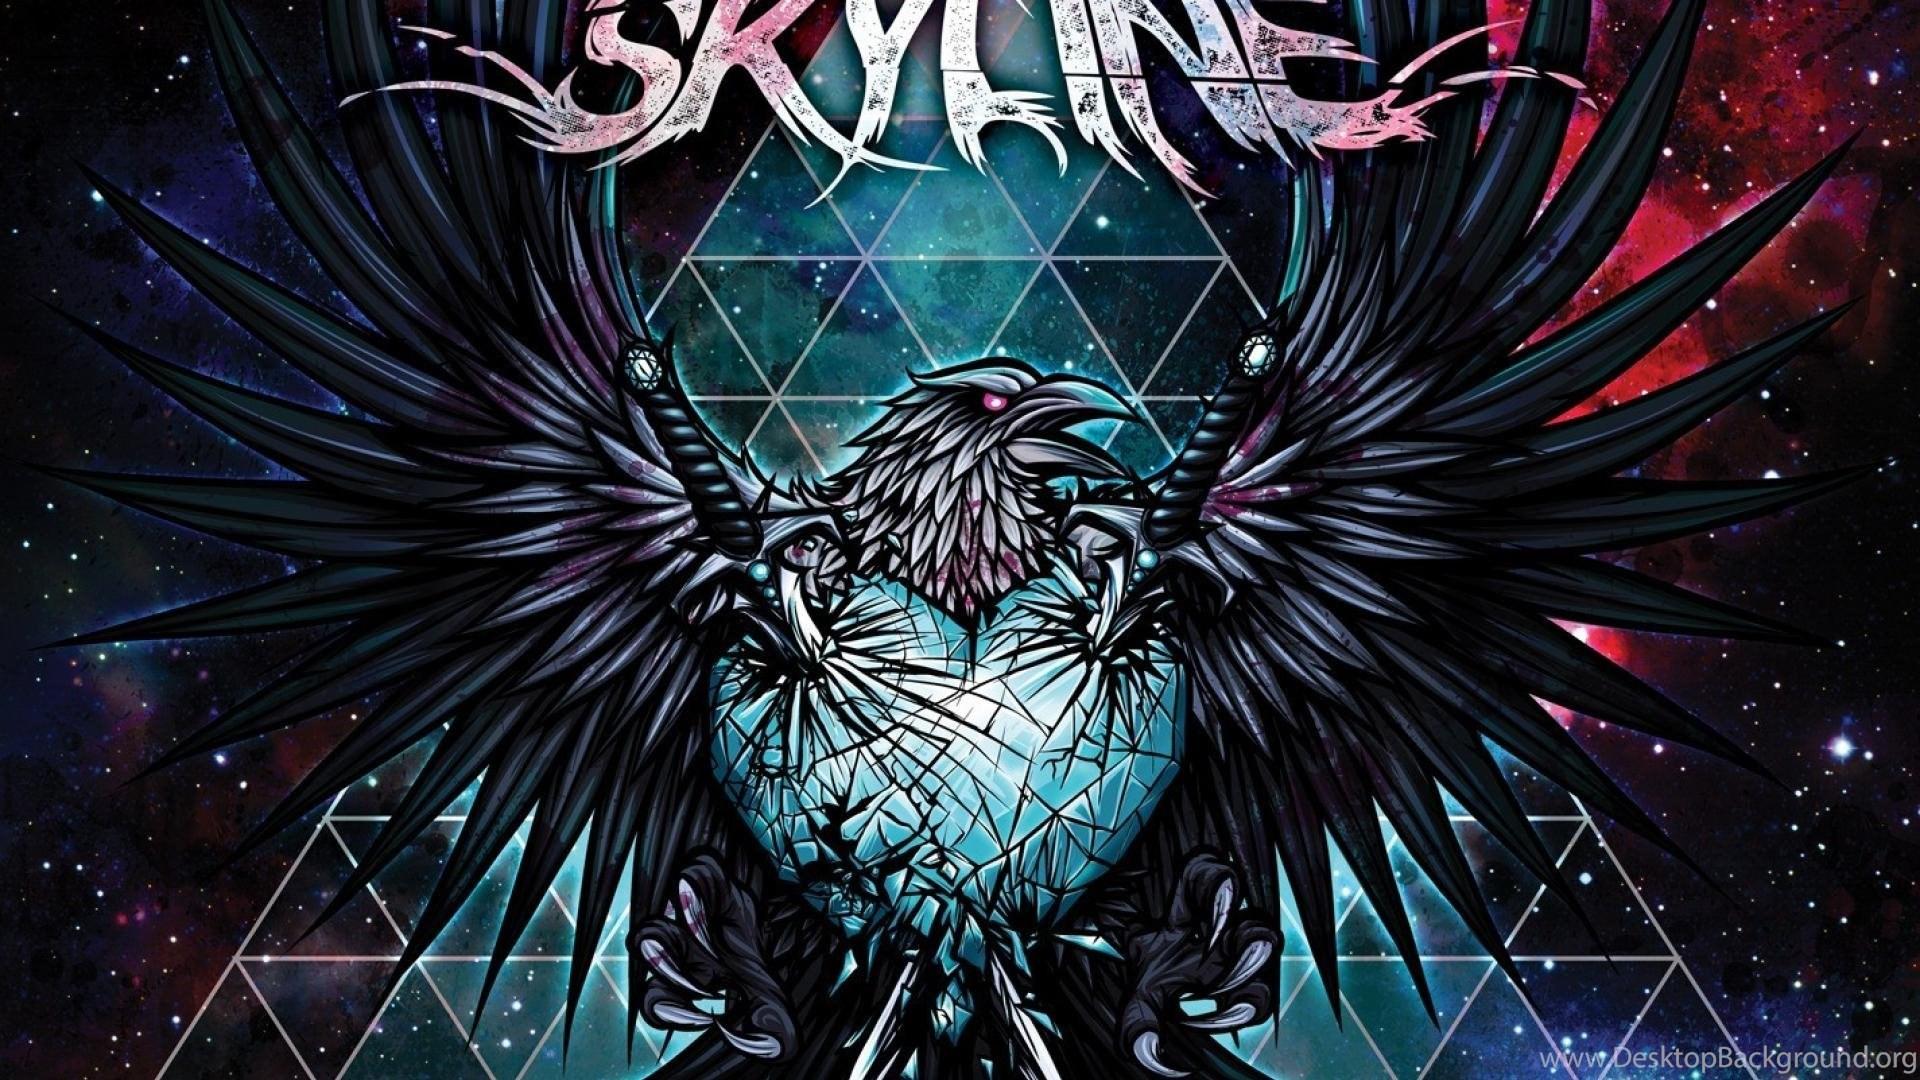 Design Album Covers Metal Music Wallpapers Desktop Background